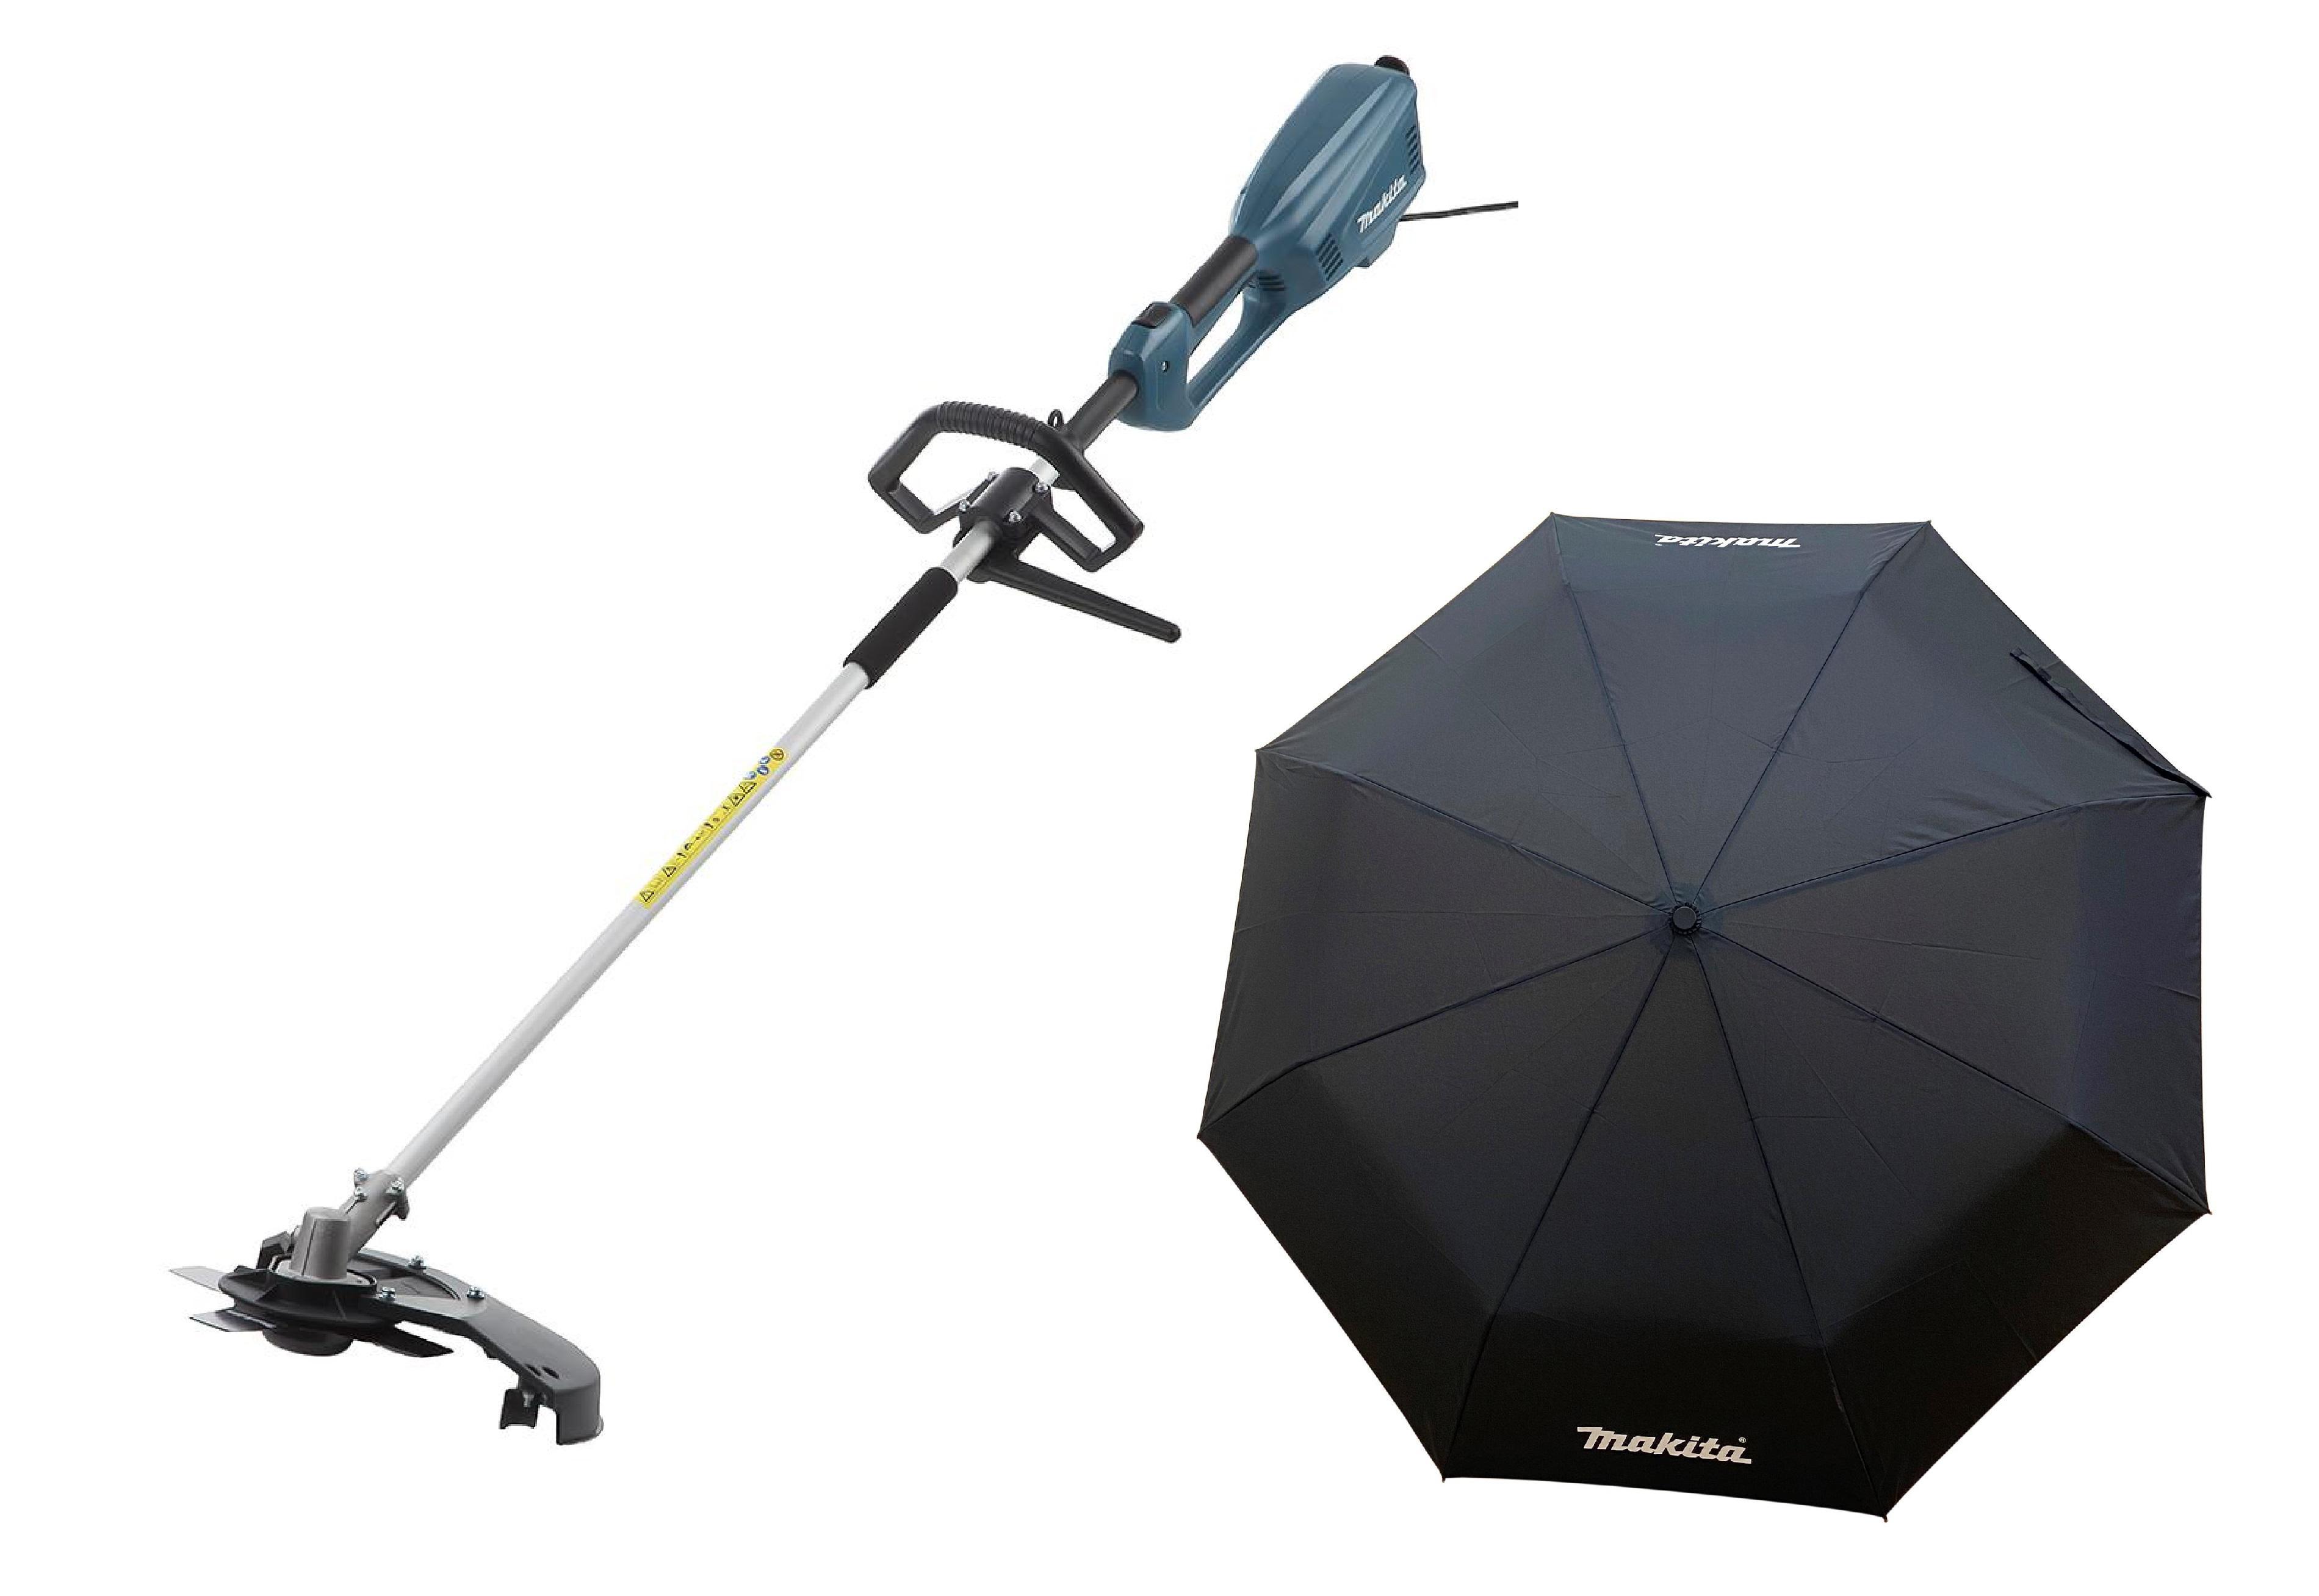 Набор Makita Триммер ur3502 +Зонт складной pgh-180150